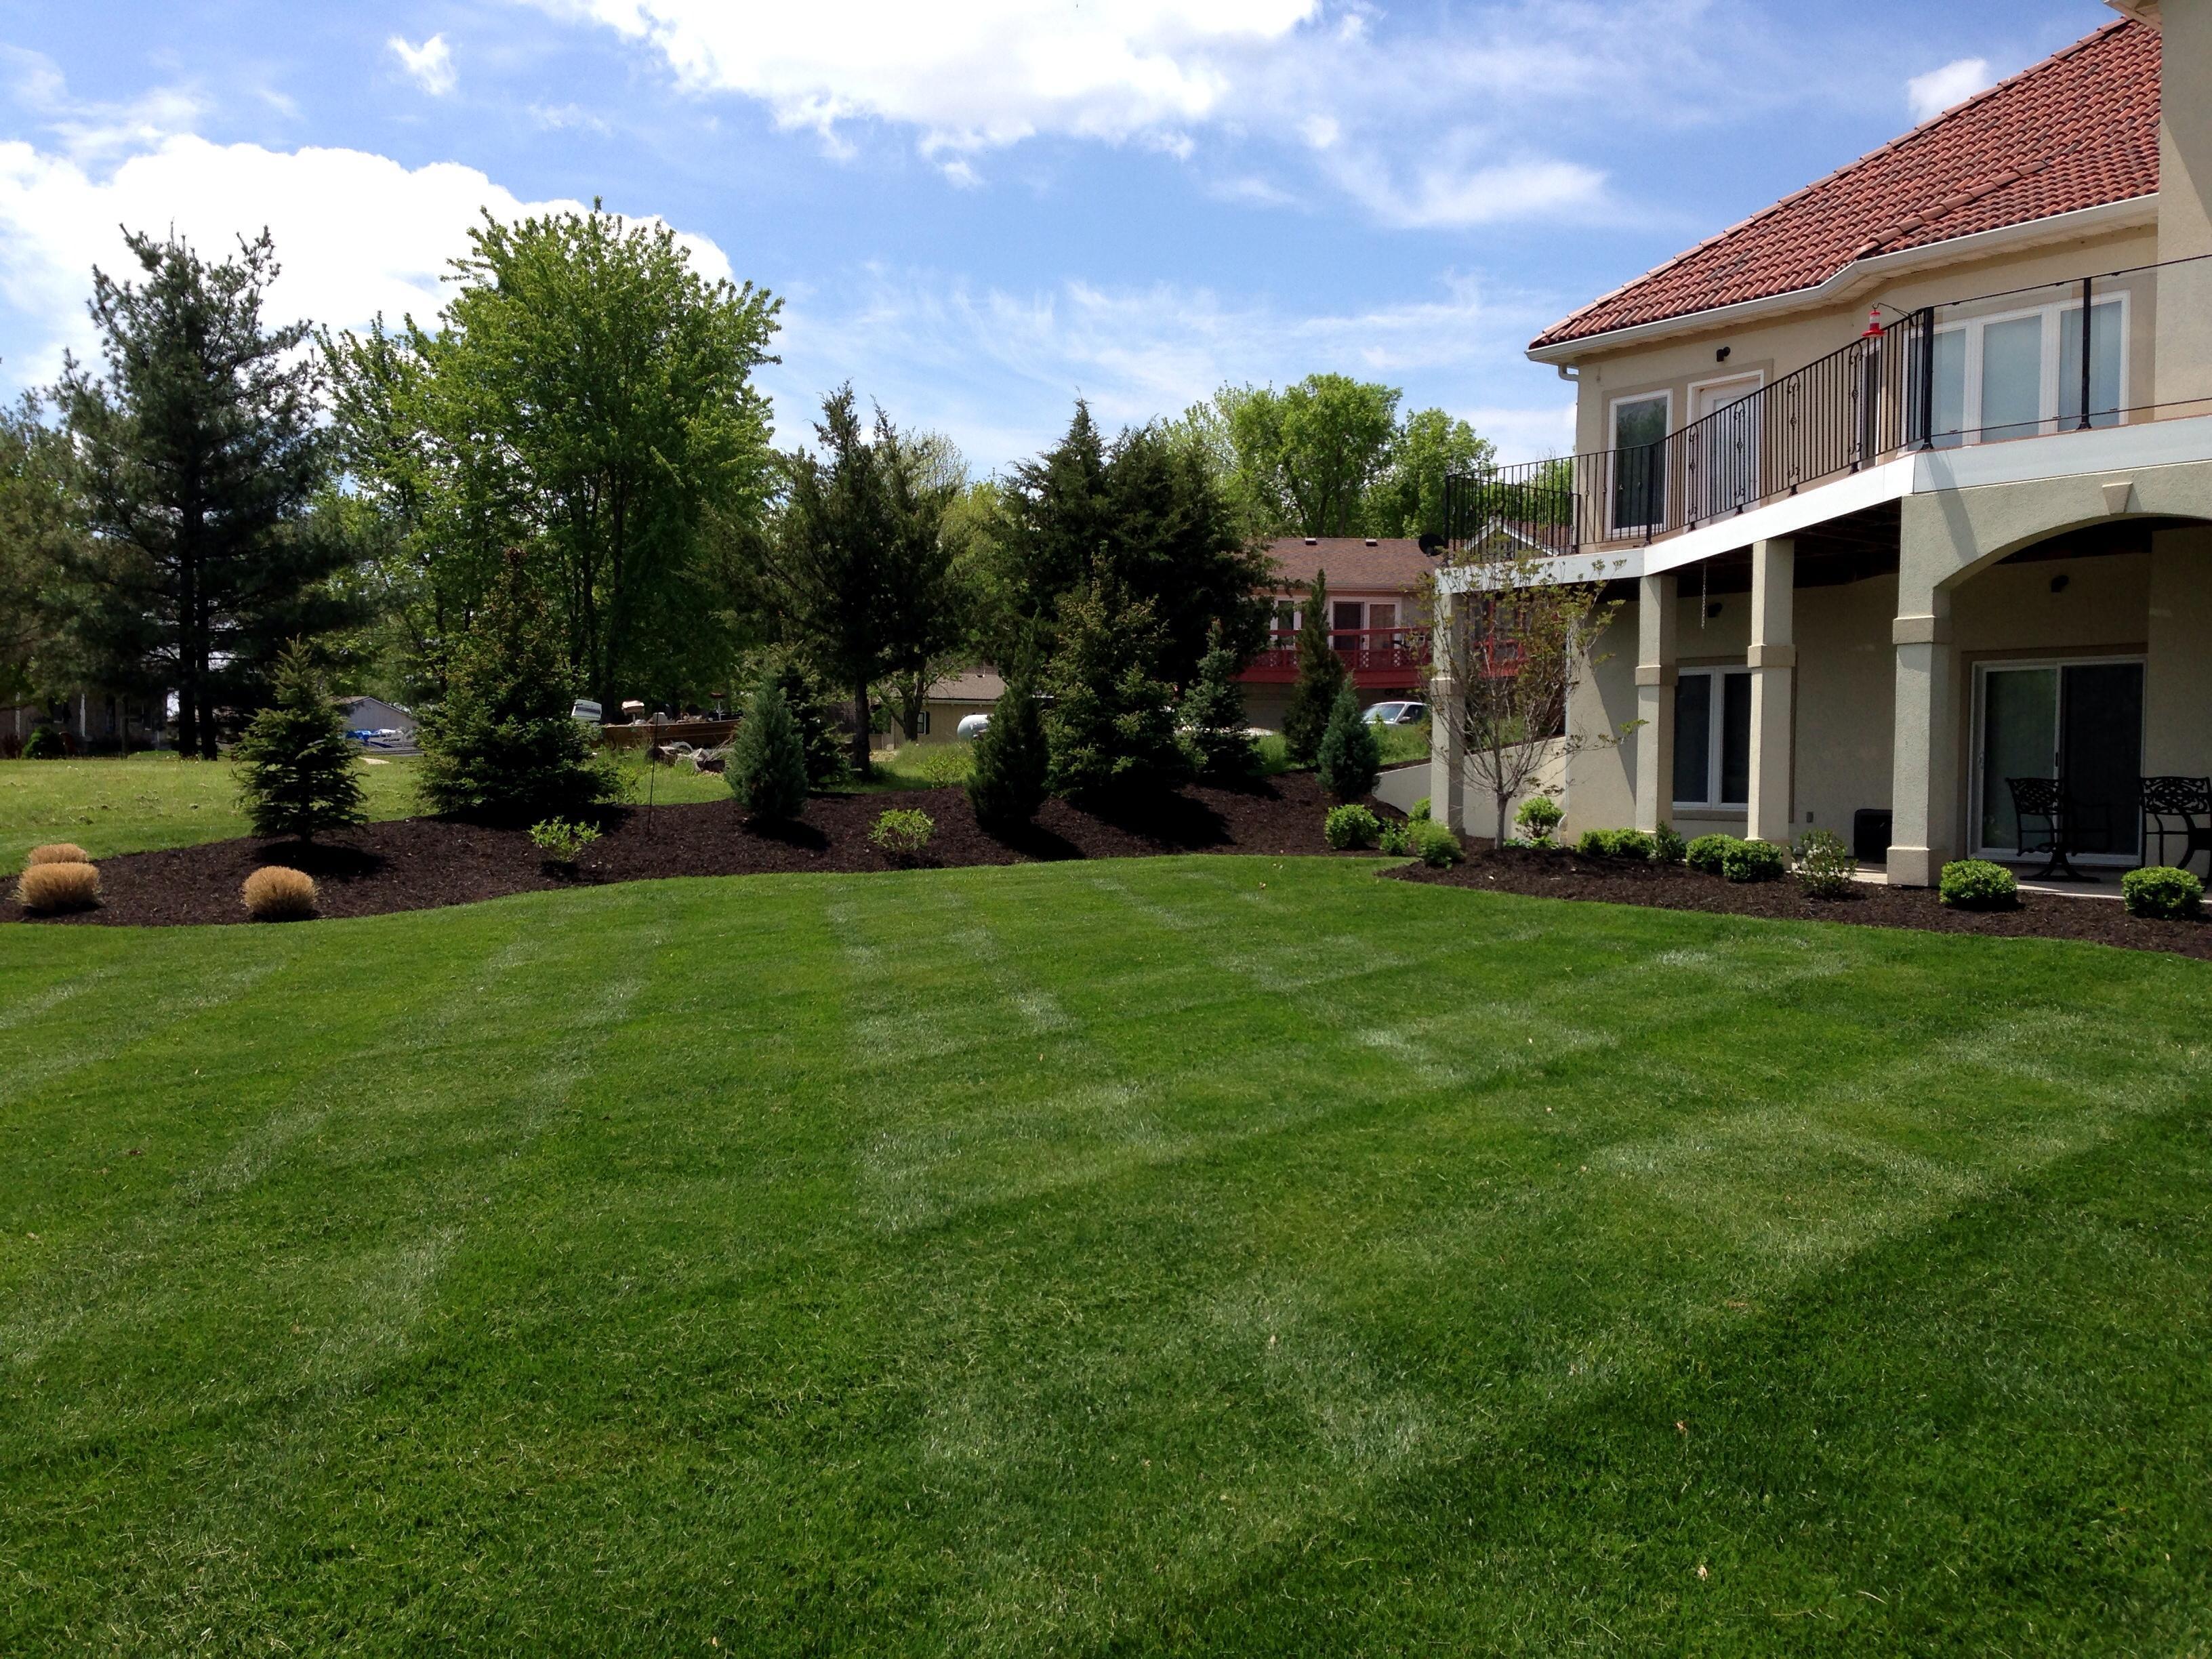 Bradford Street Lawn & Landscaping, LLC image 6